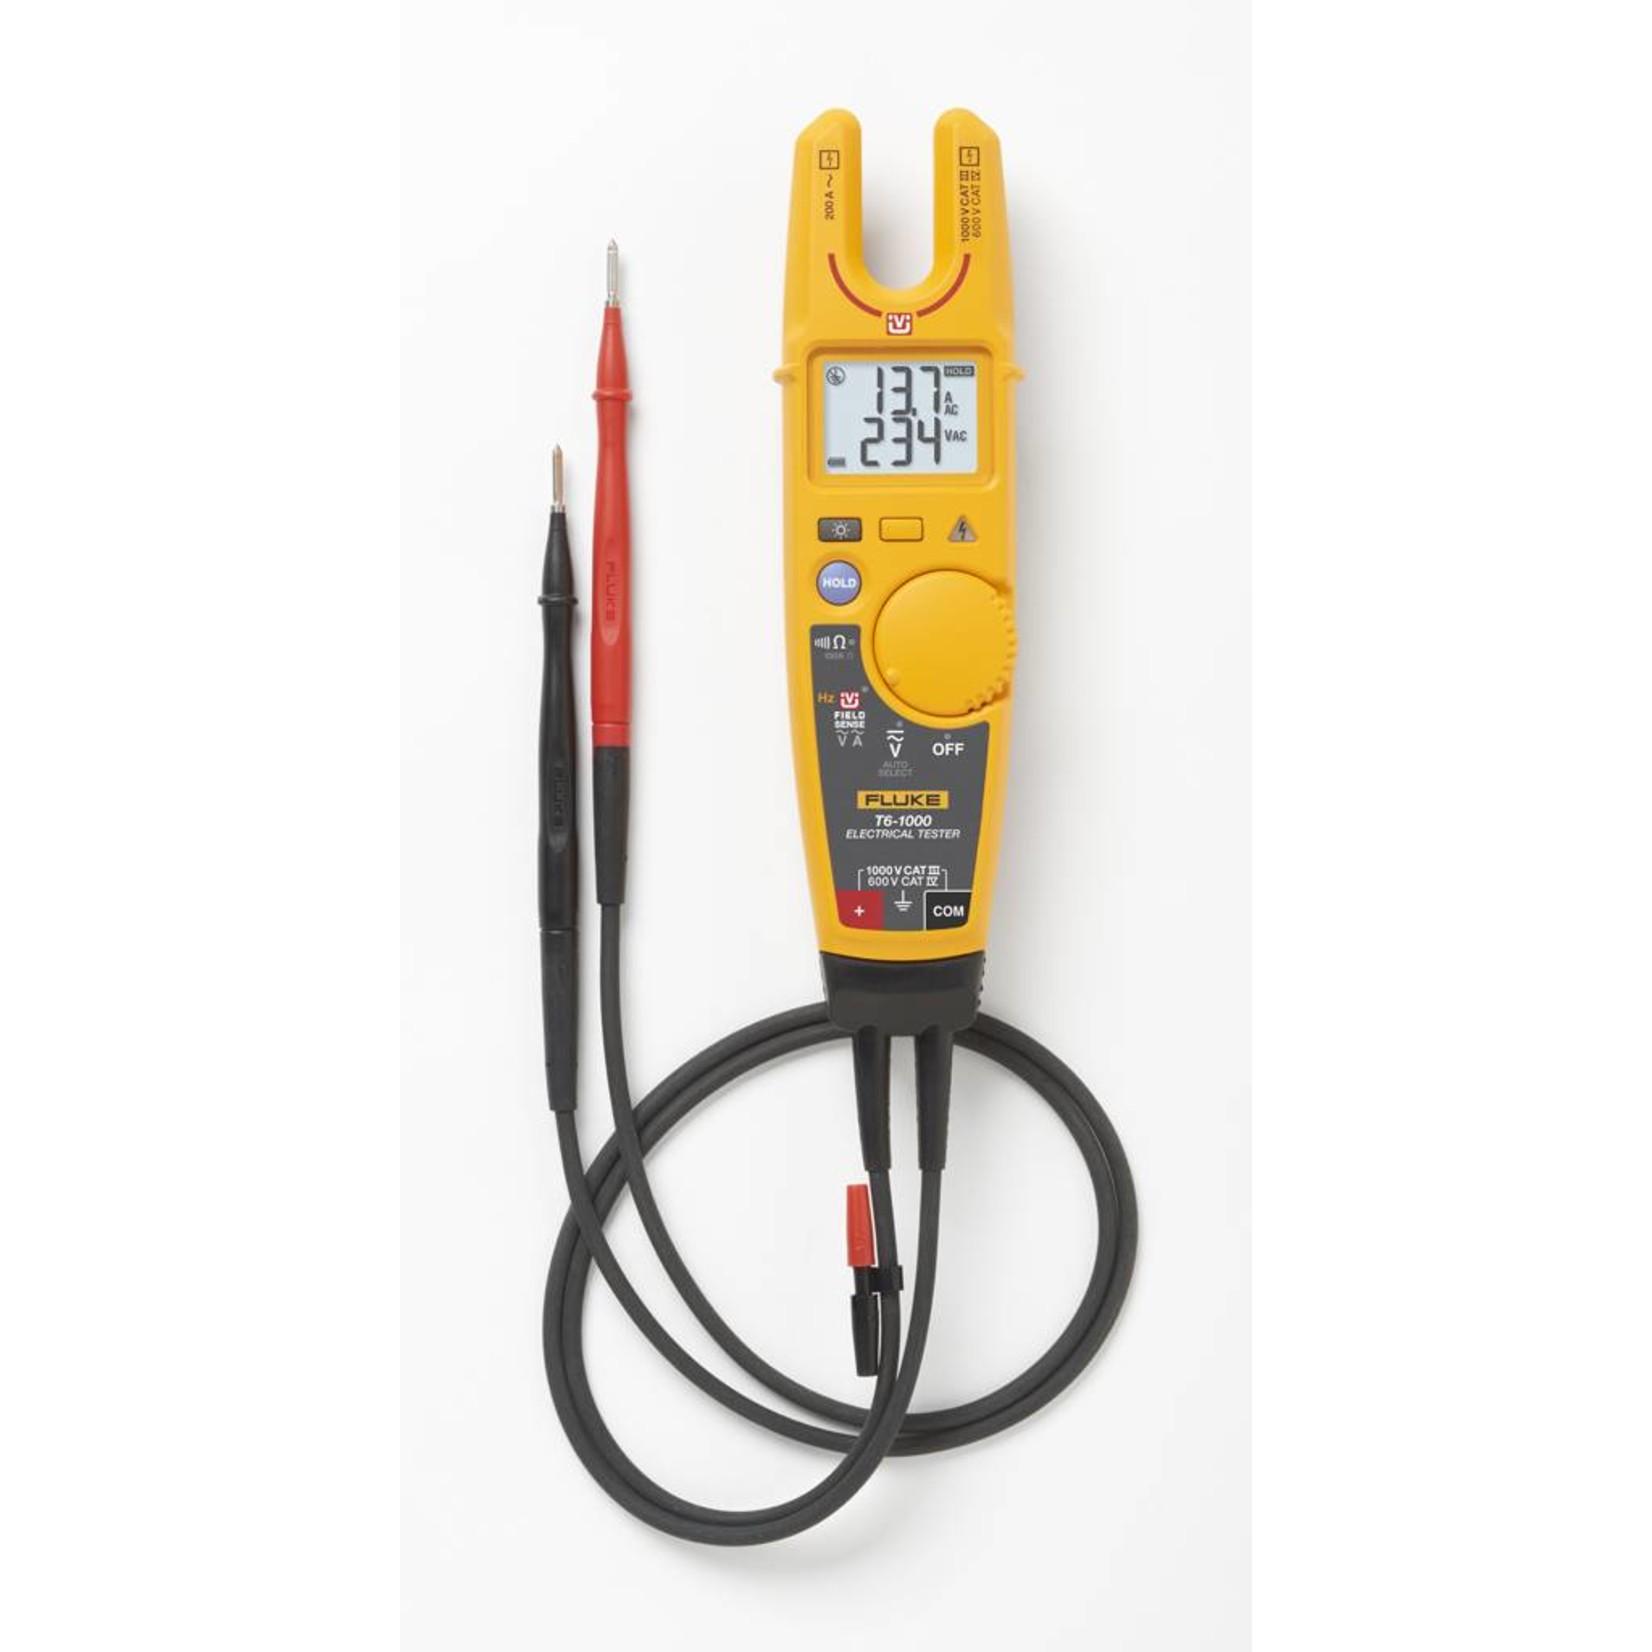 Fluke Testeur électrique Fluke T6-1000 avec FieldSense ™